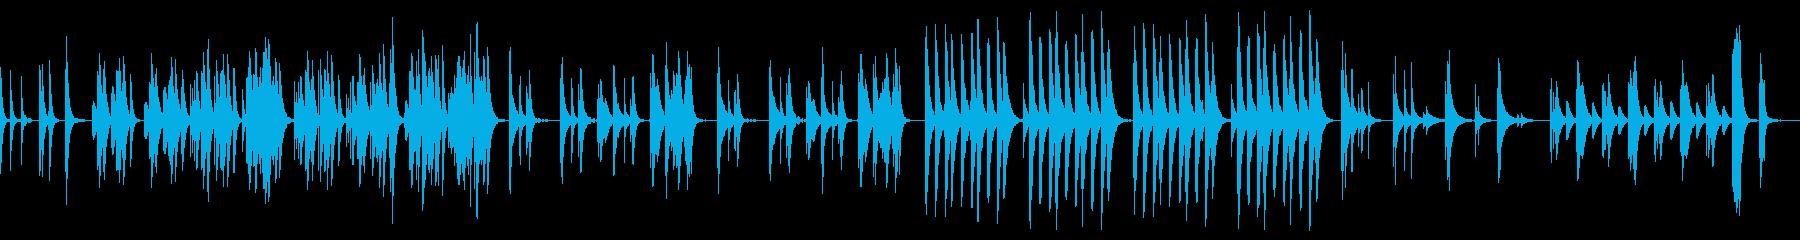 Marimba Lifeの再生済みの波形